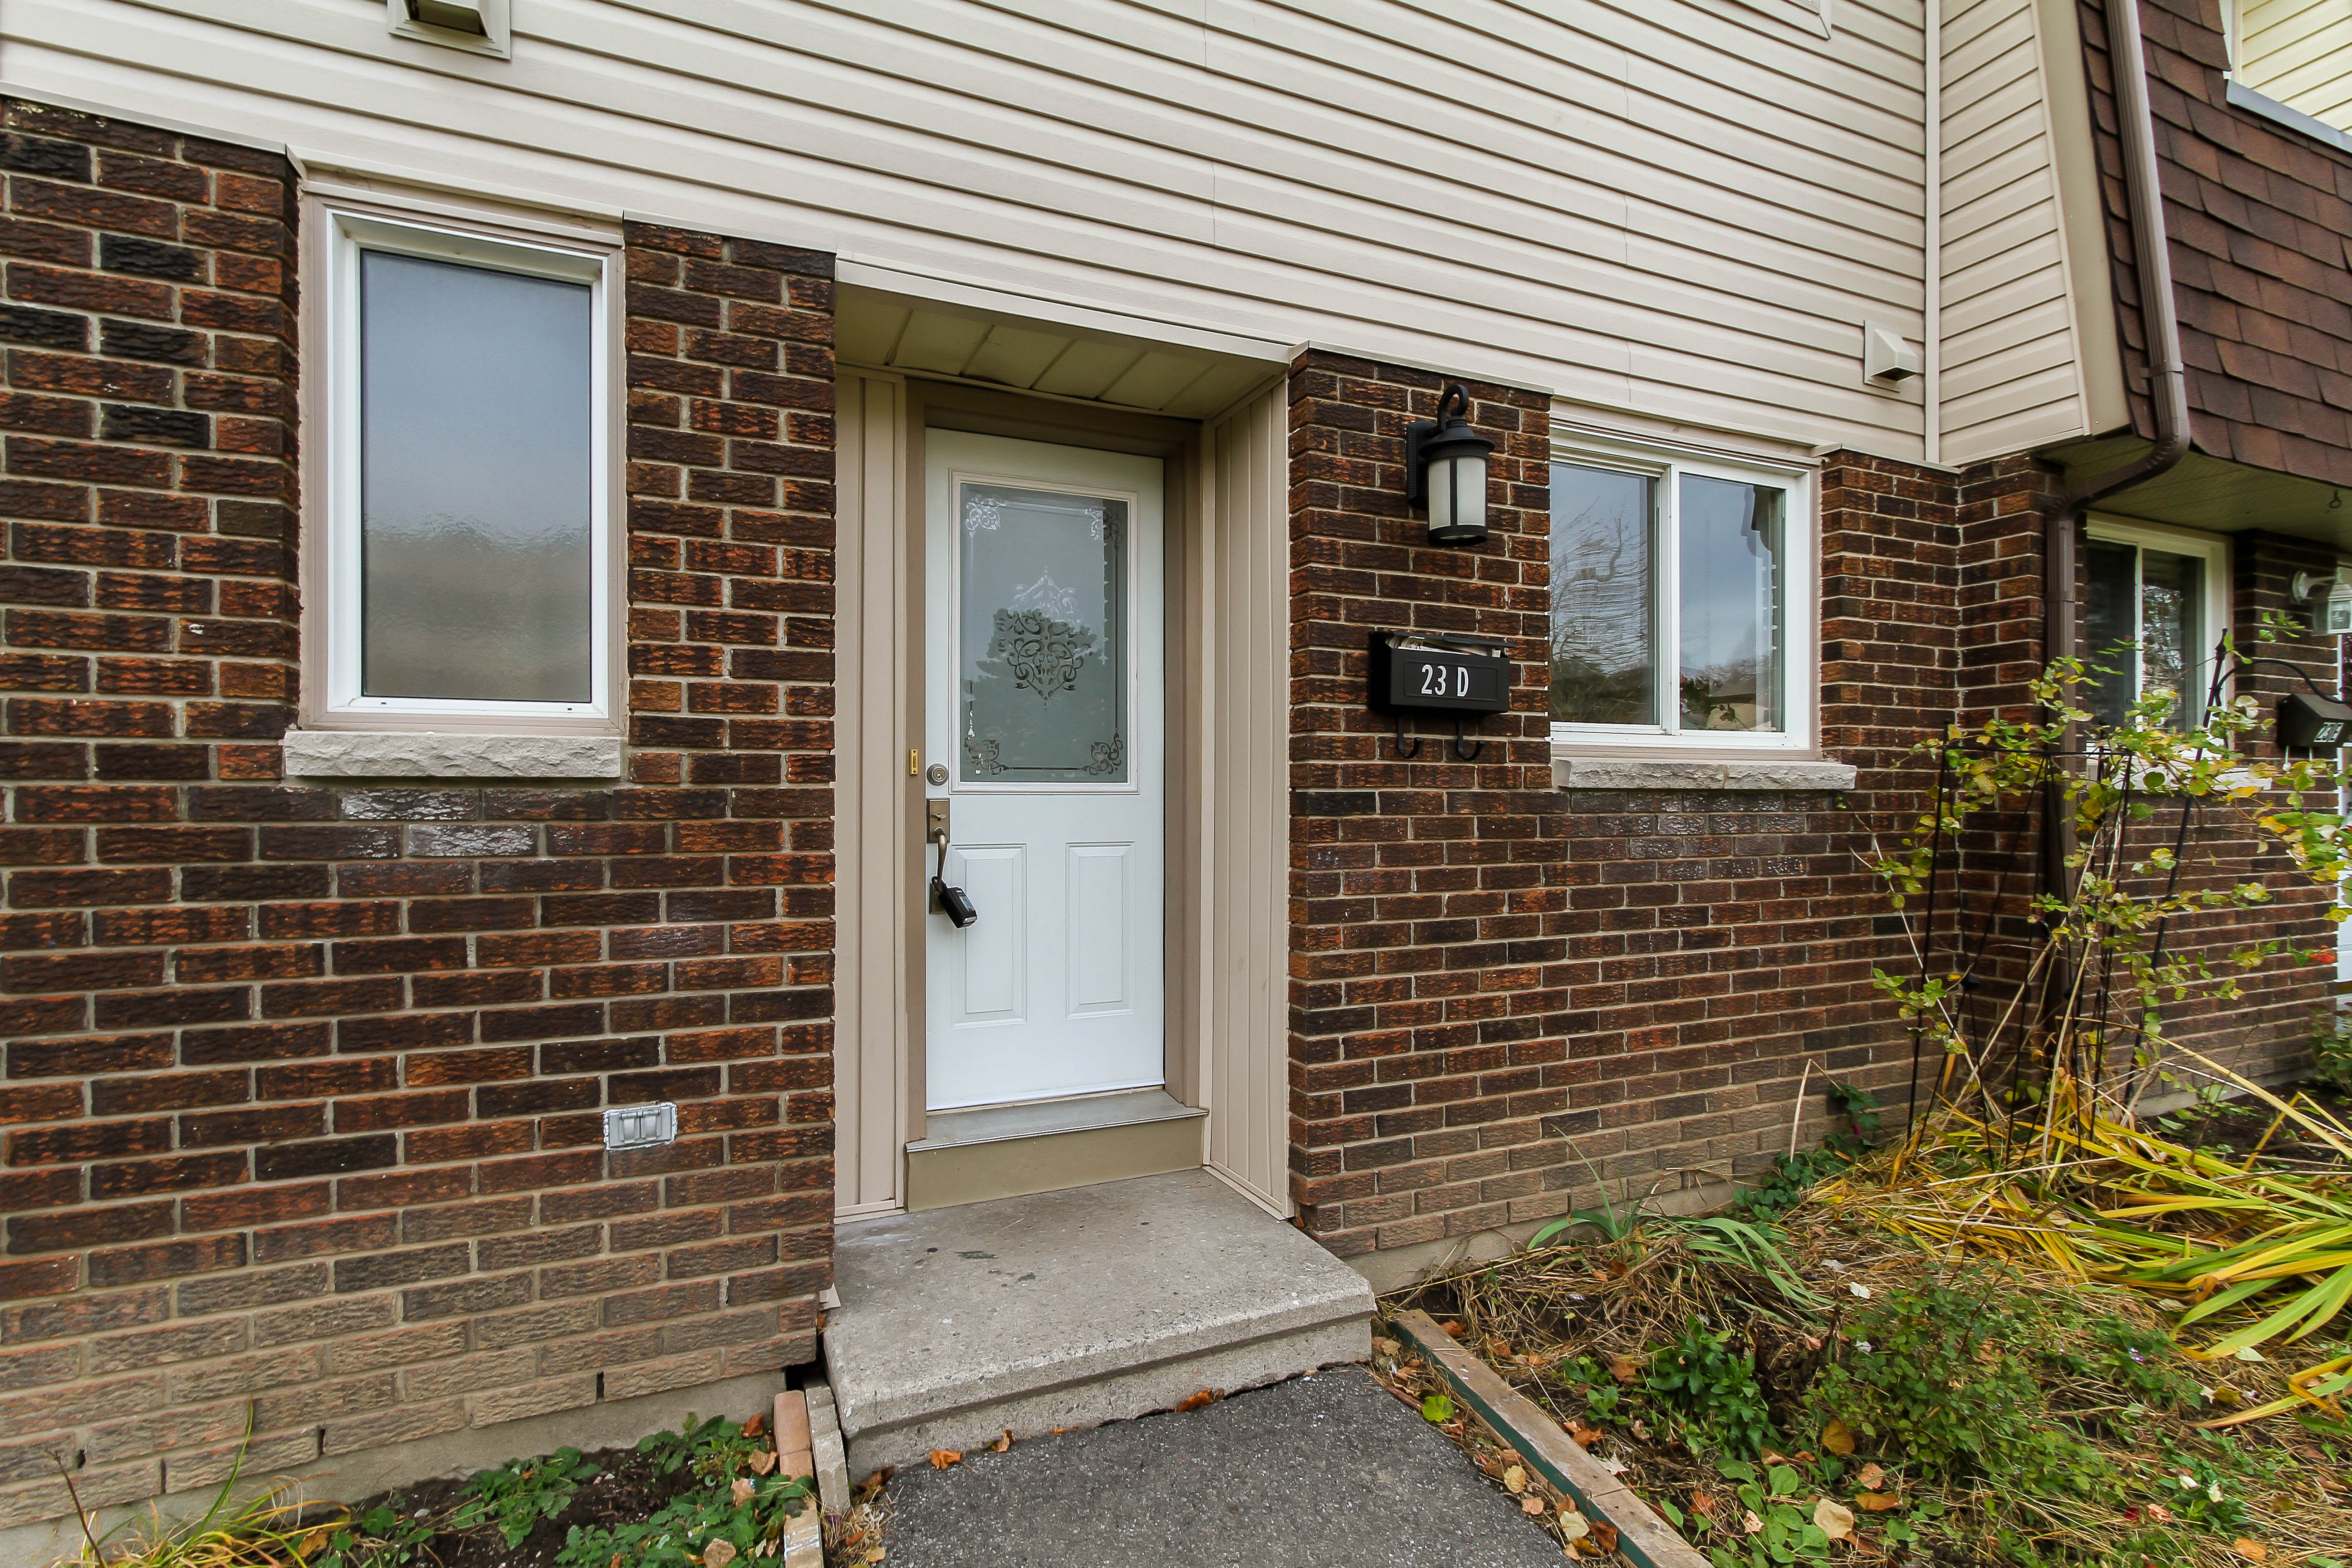 23d Sonnet Crescent Rent In Ottawa Property Management